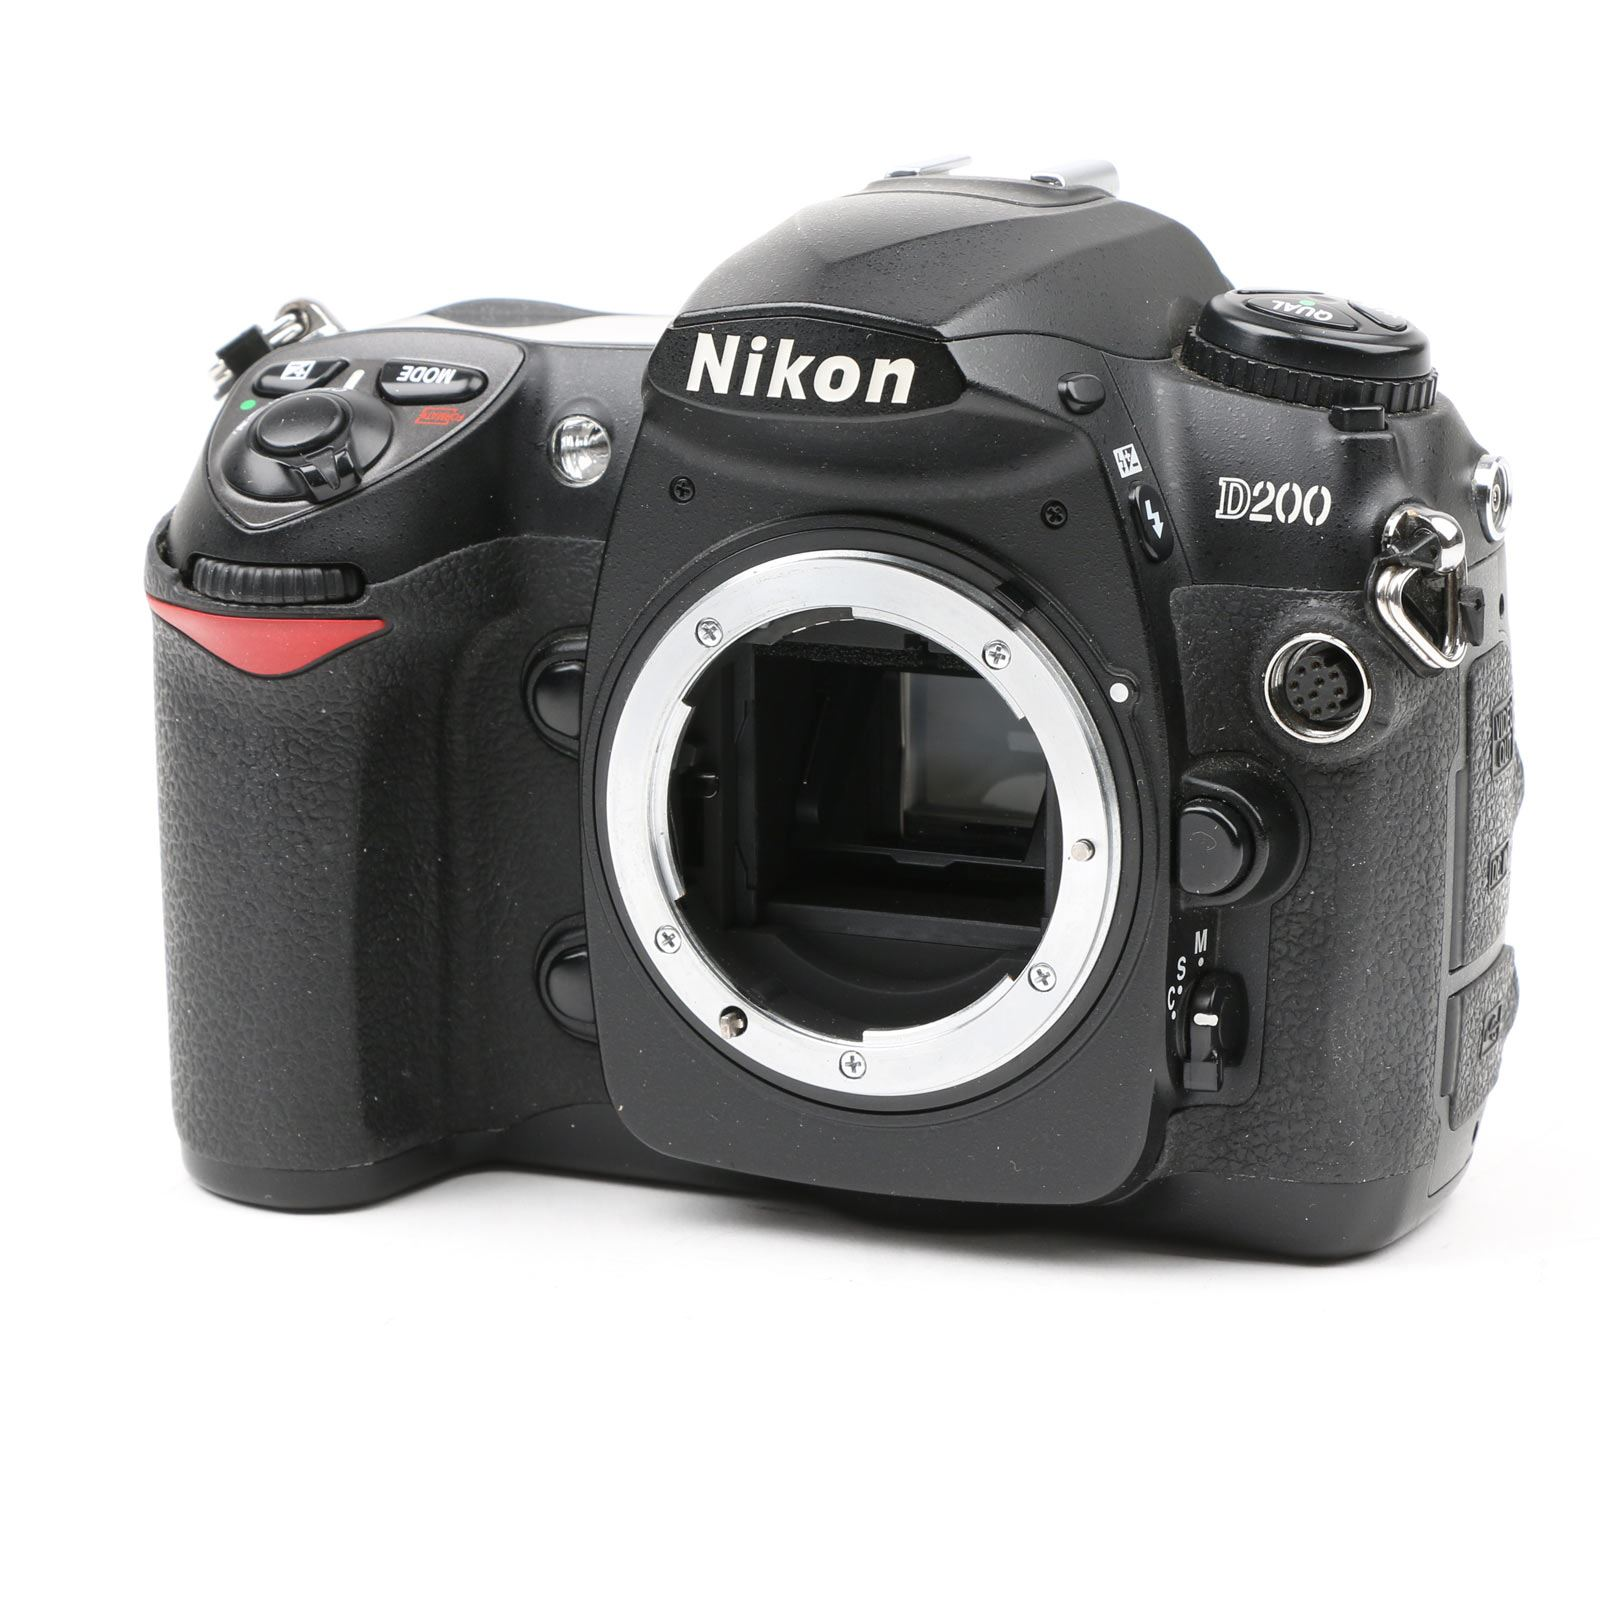 Image of Used Nikon D200 Digital SLR Camera Body